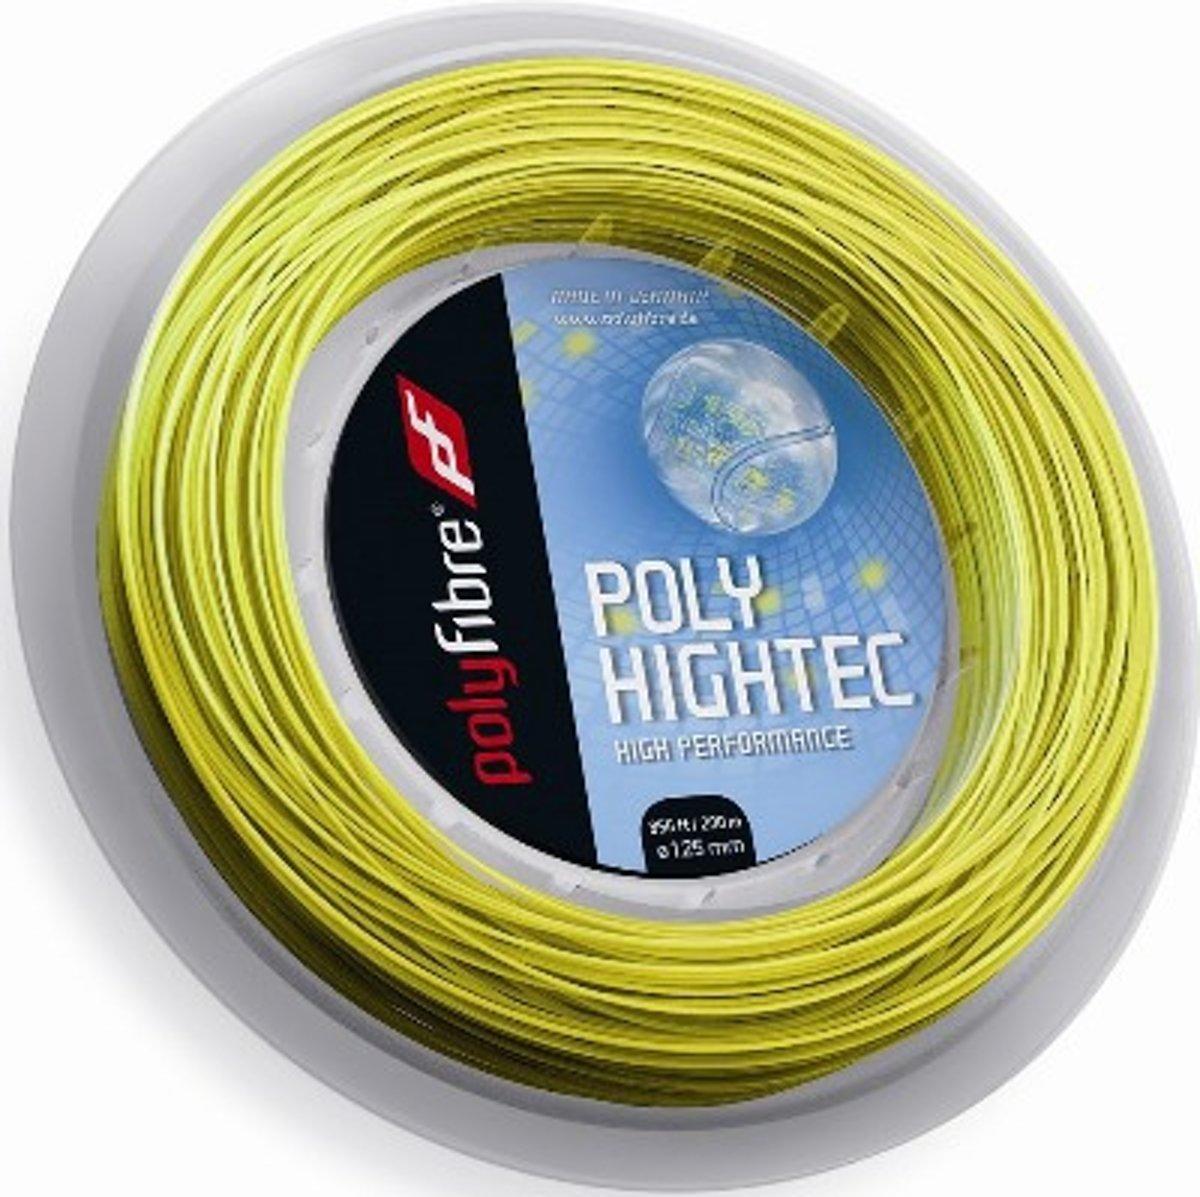 Polyfibre Poly Hightec 200 m. tennissnaar 1,15 mm. kopen